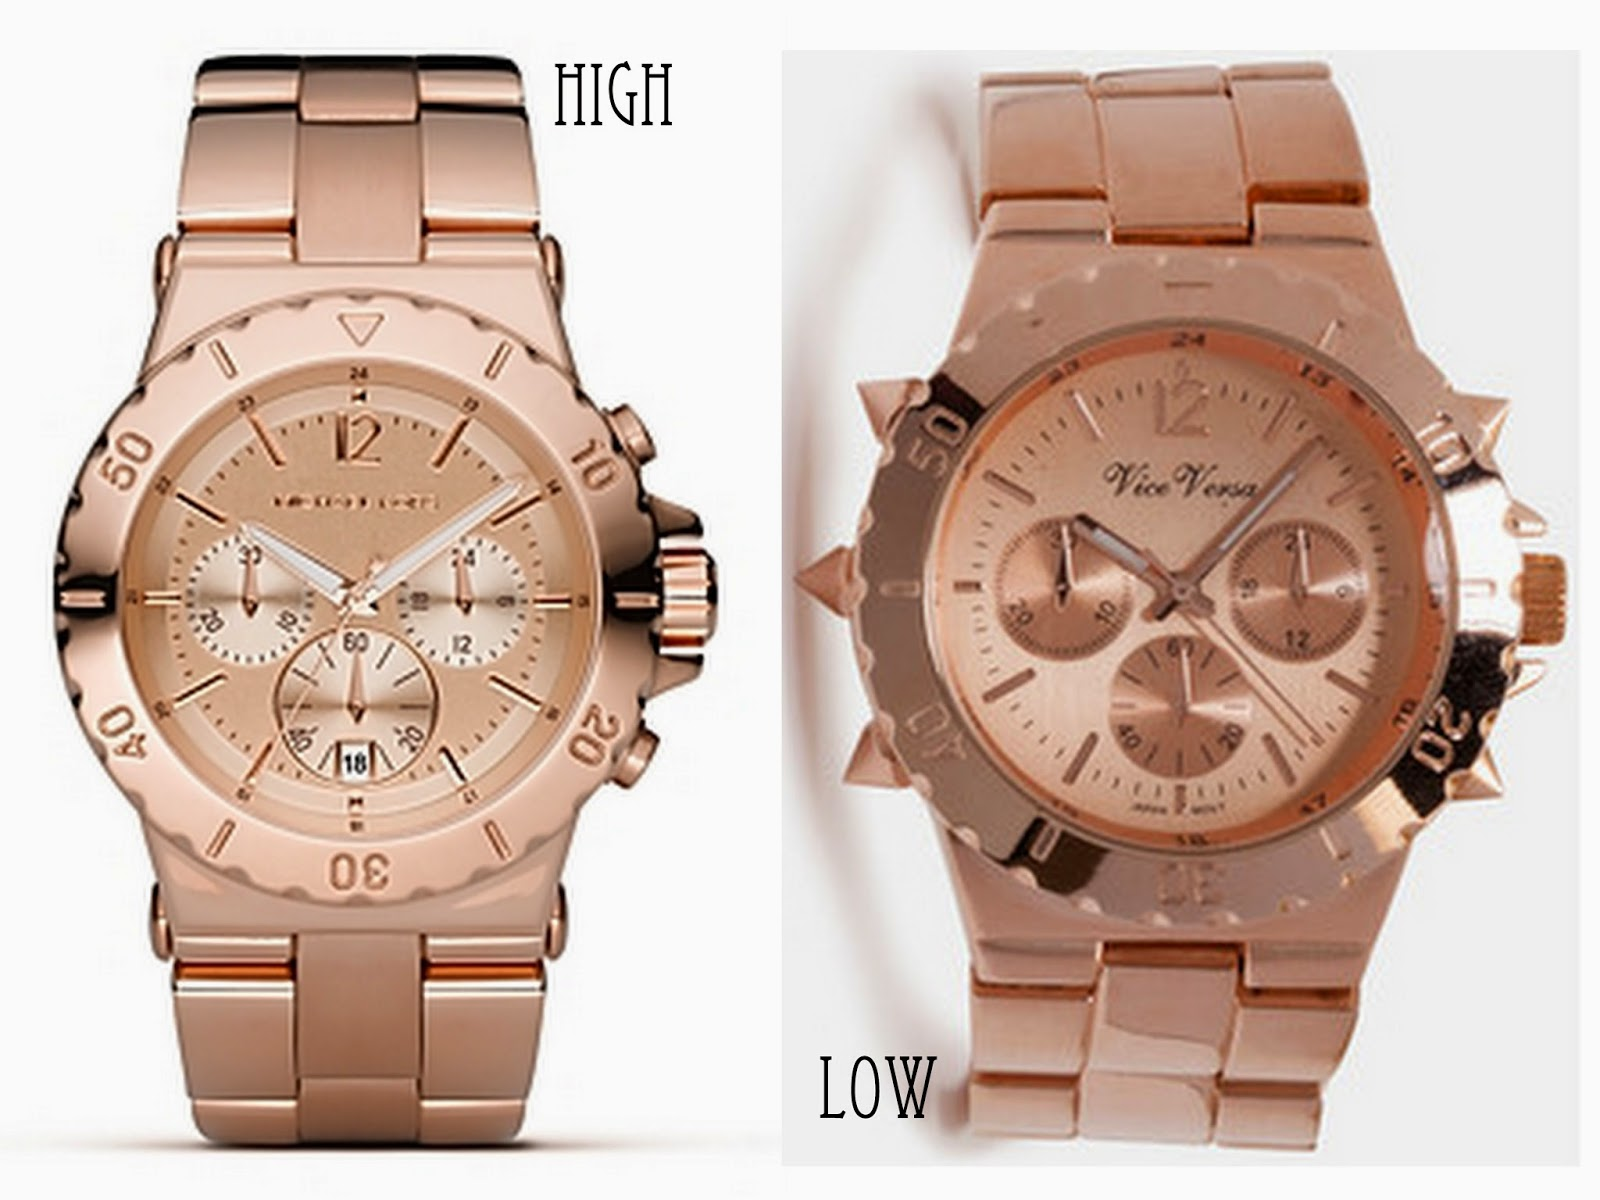 181de143c310 Michael kors watches rose gold limited edition